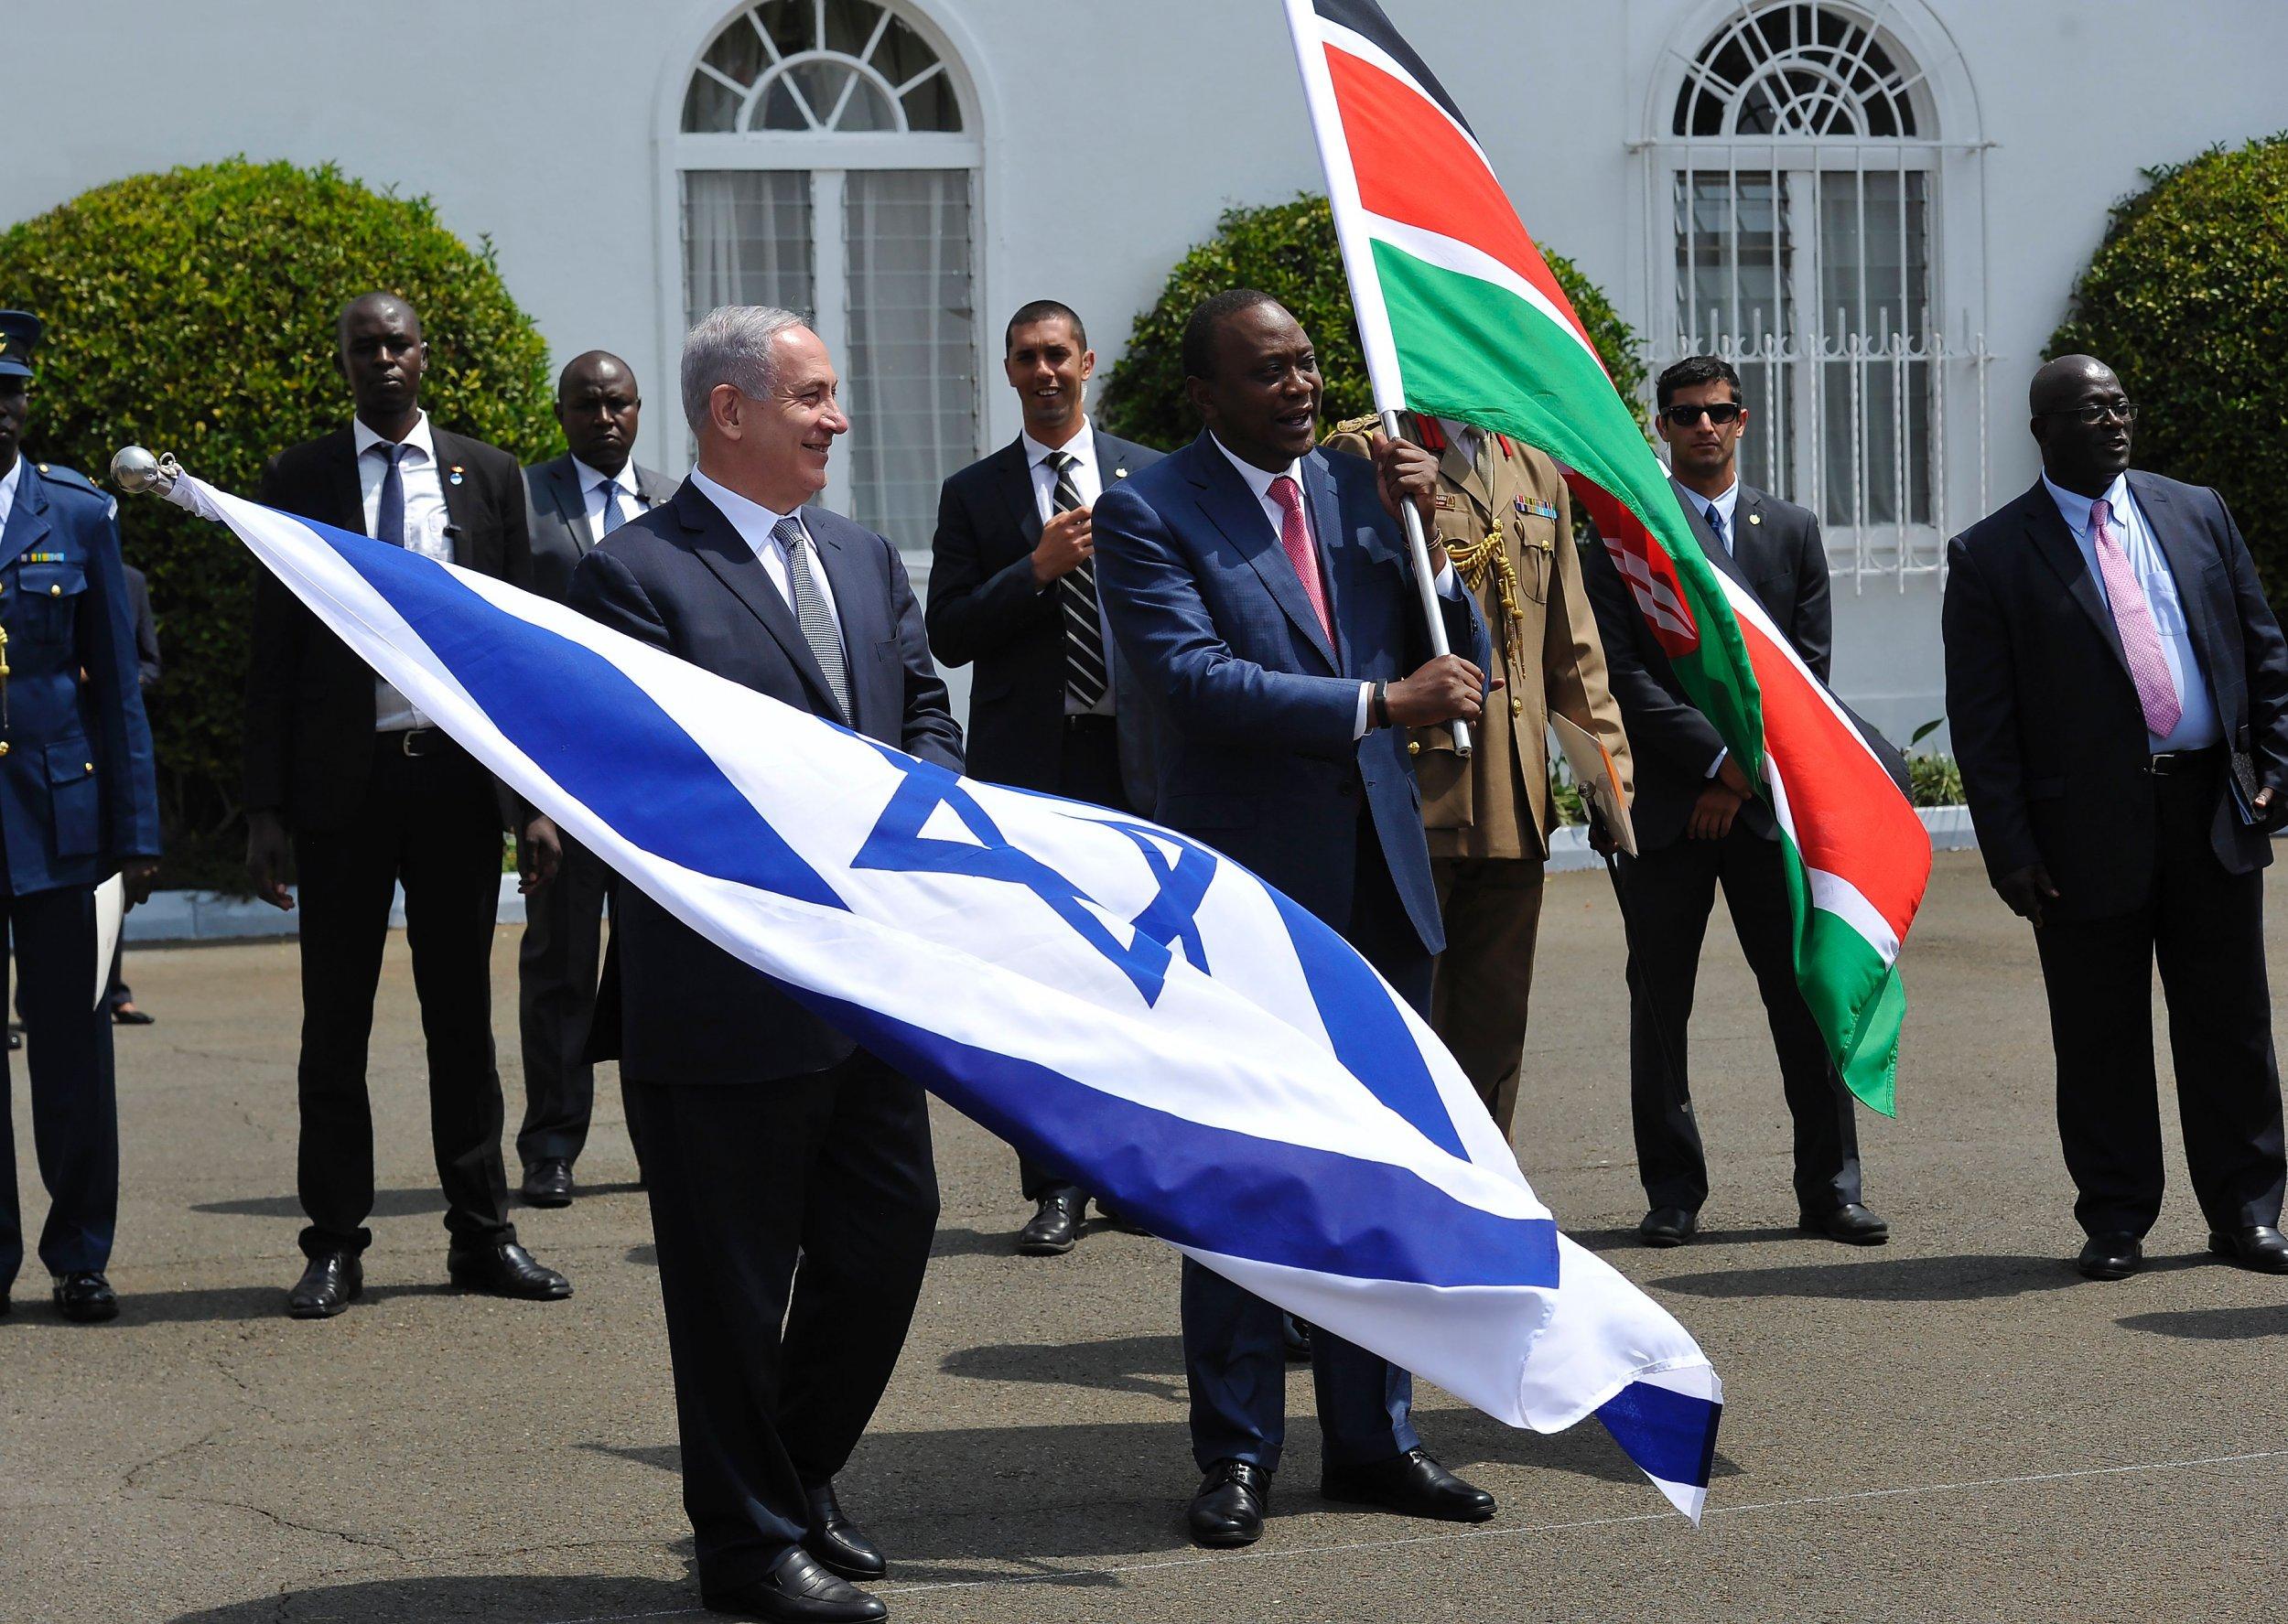 Benjamin Netanyahu and Uhuru Kenyatta wave flags